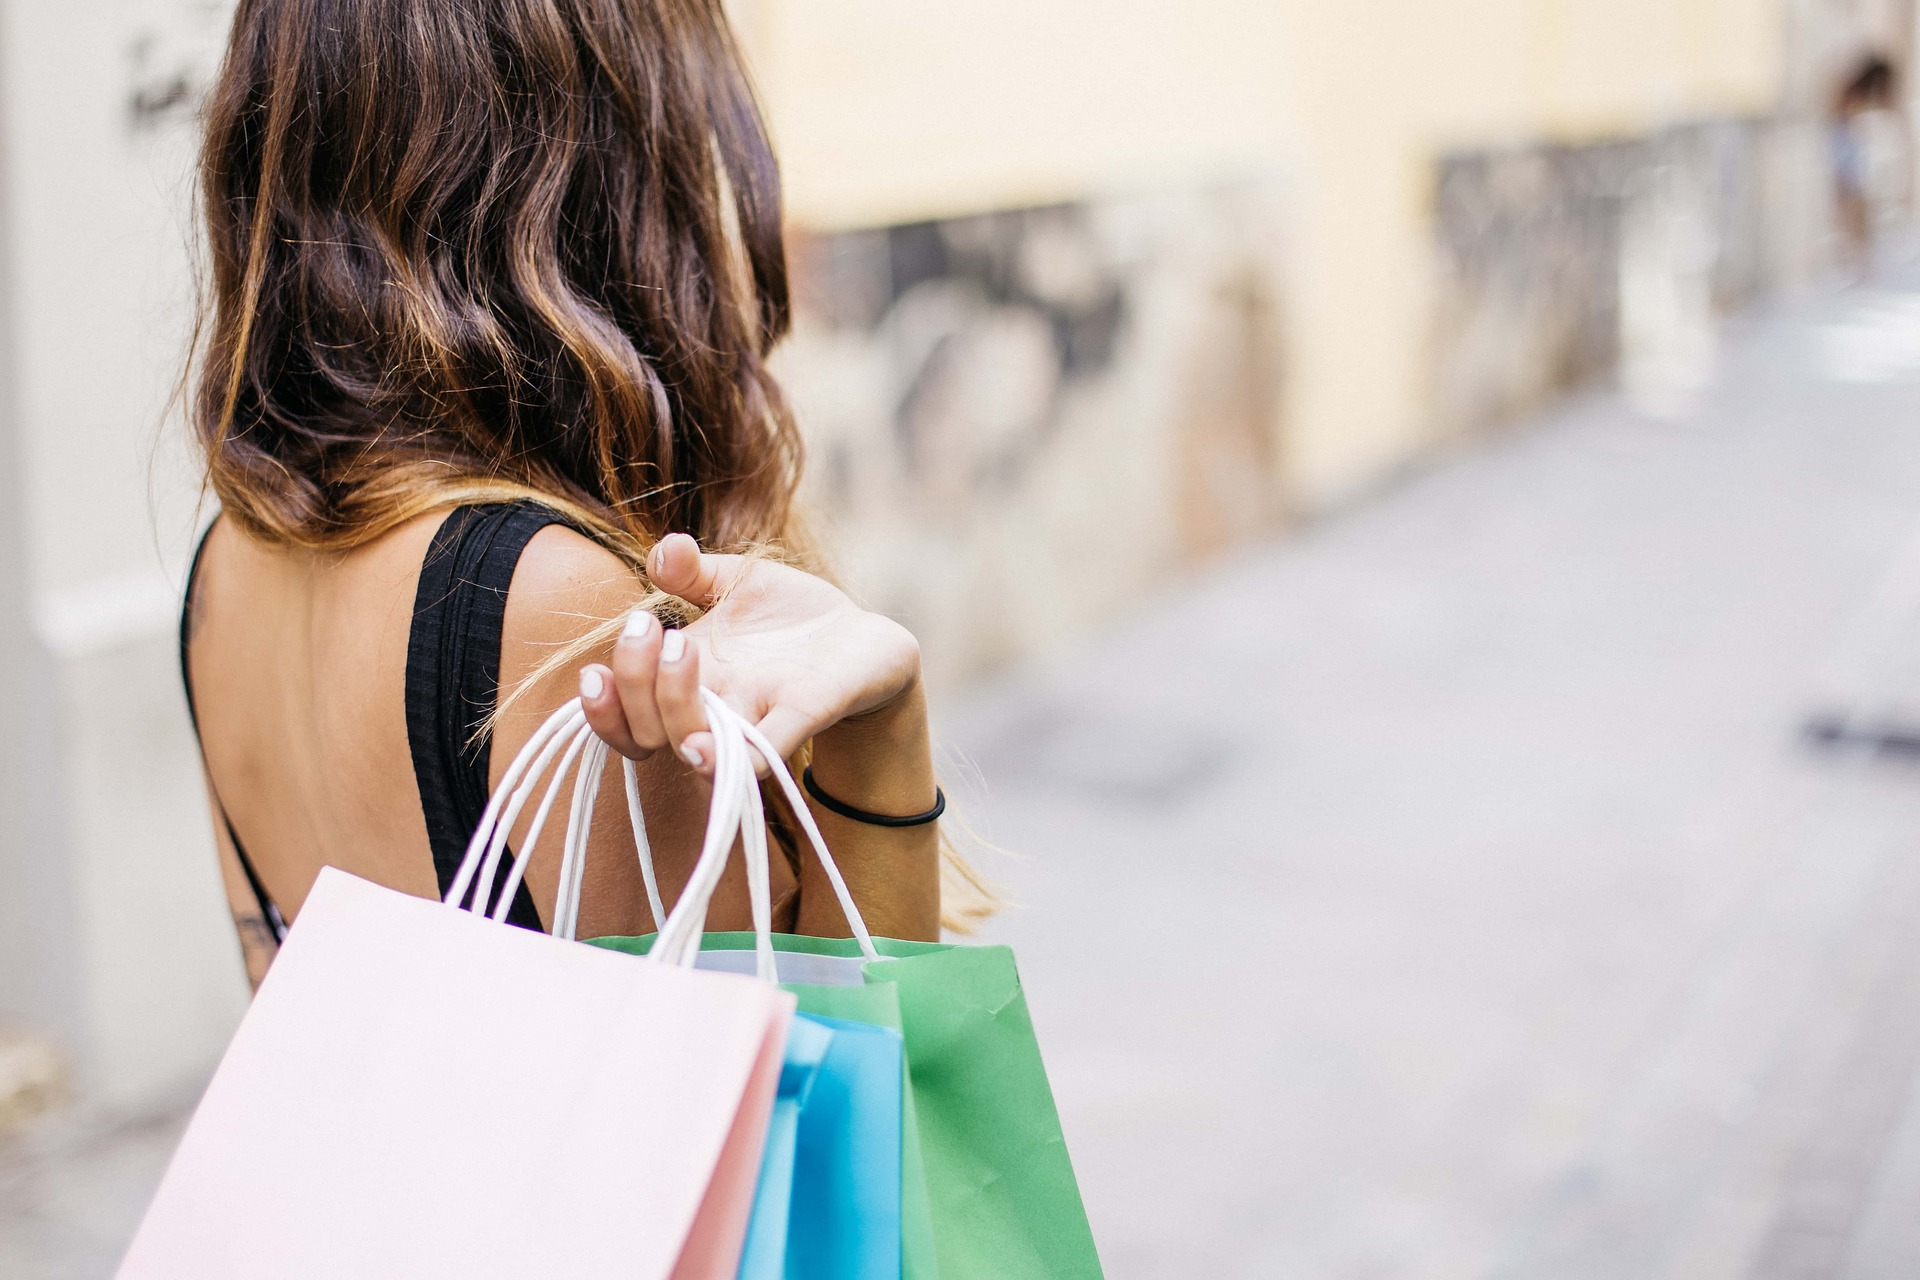 Is the Increase in Retail Sales Fleeting?